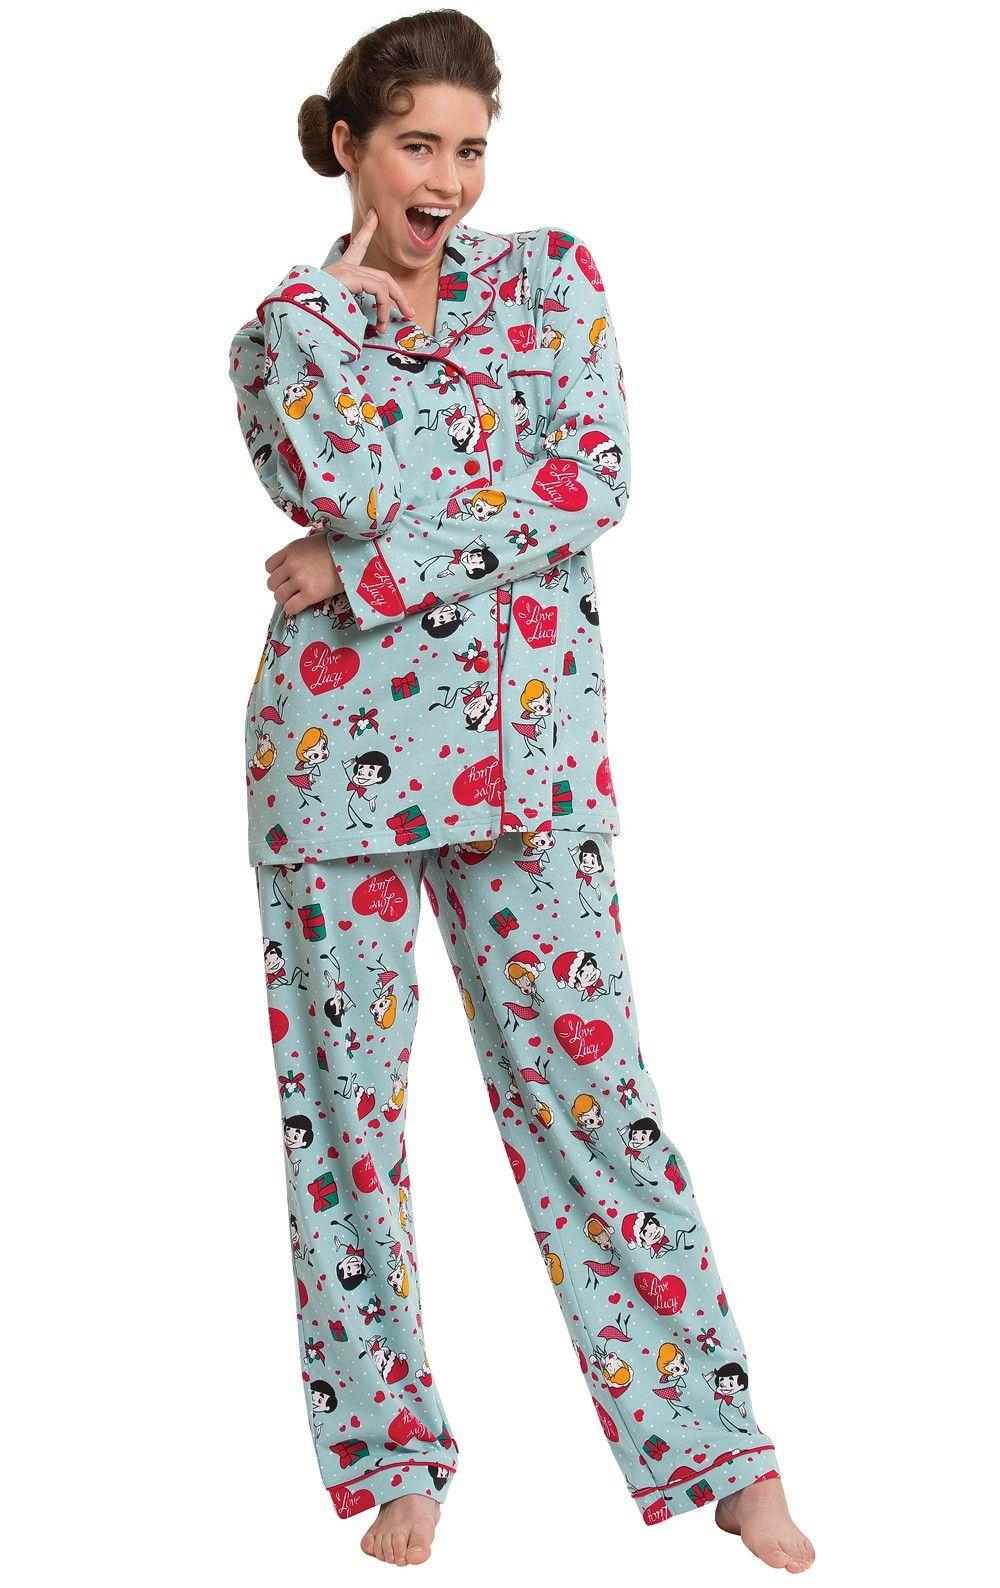 "I Love Lucy""® Christmas Pajamas"" I love lucy pajamas, I"